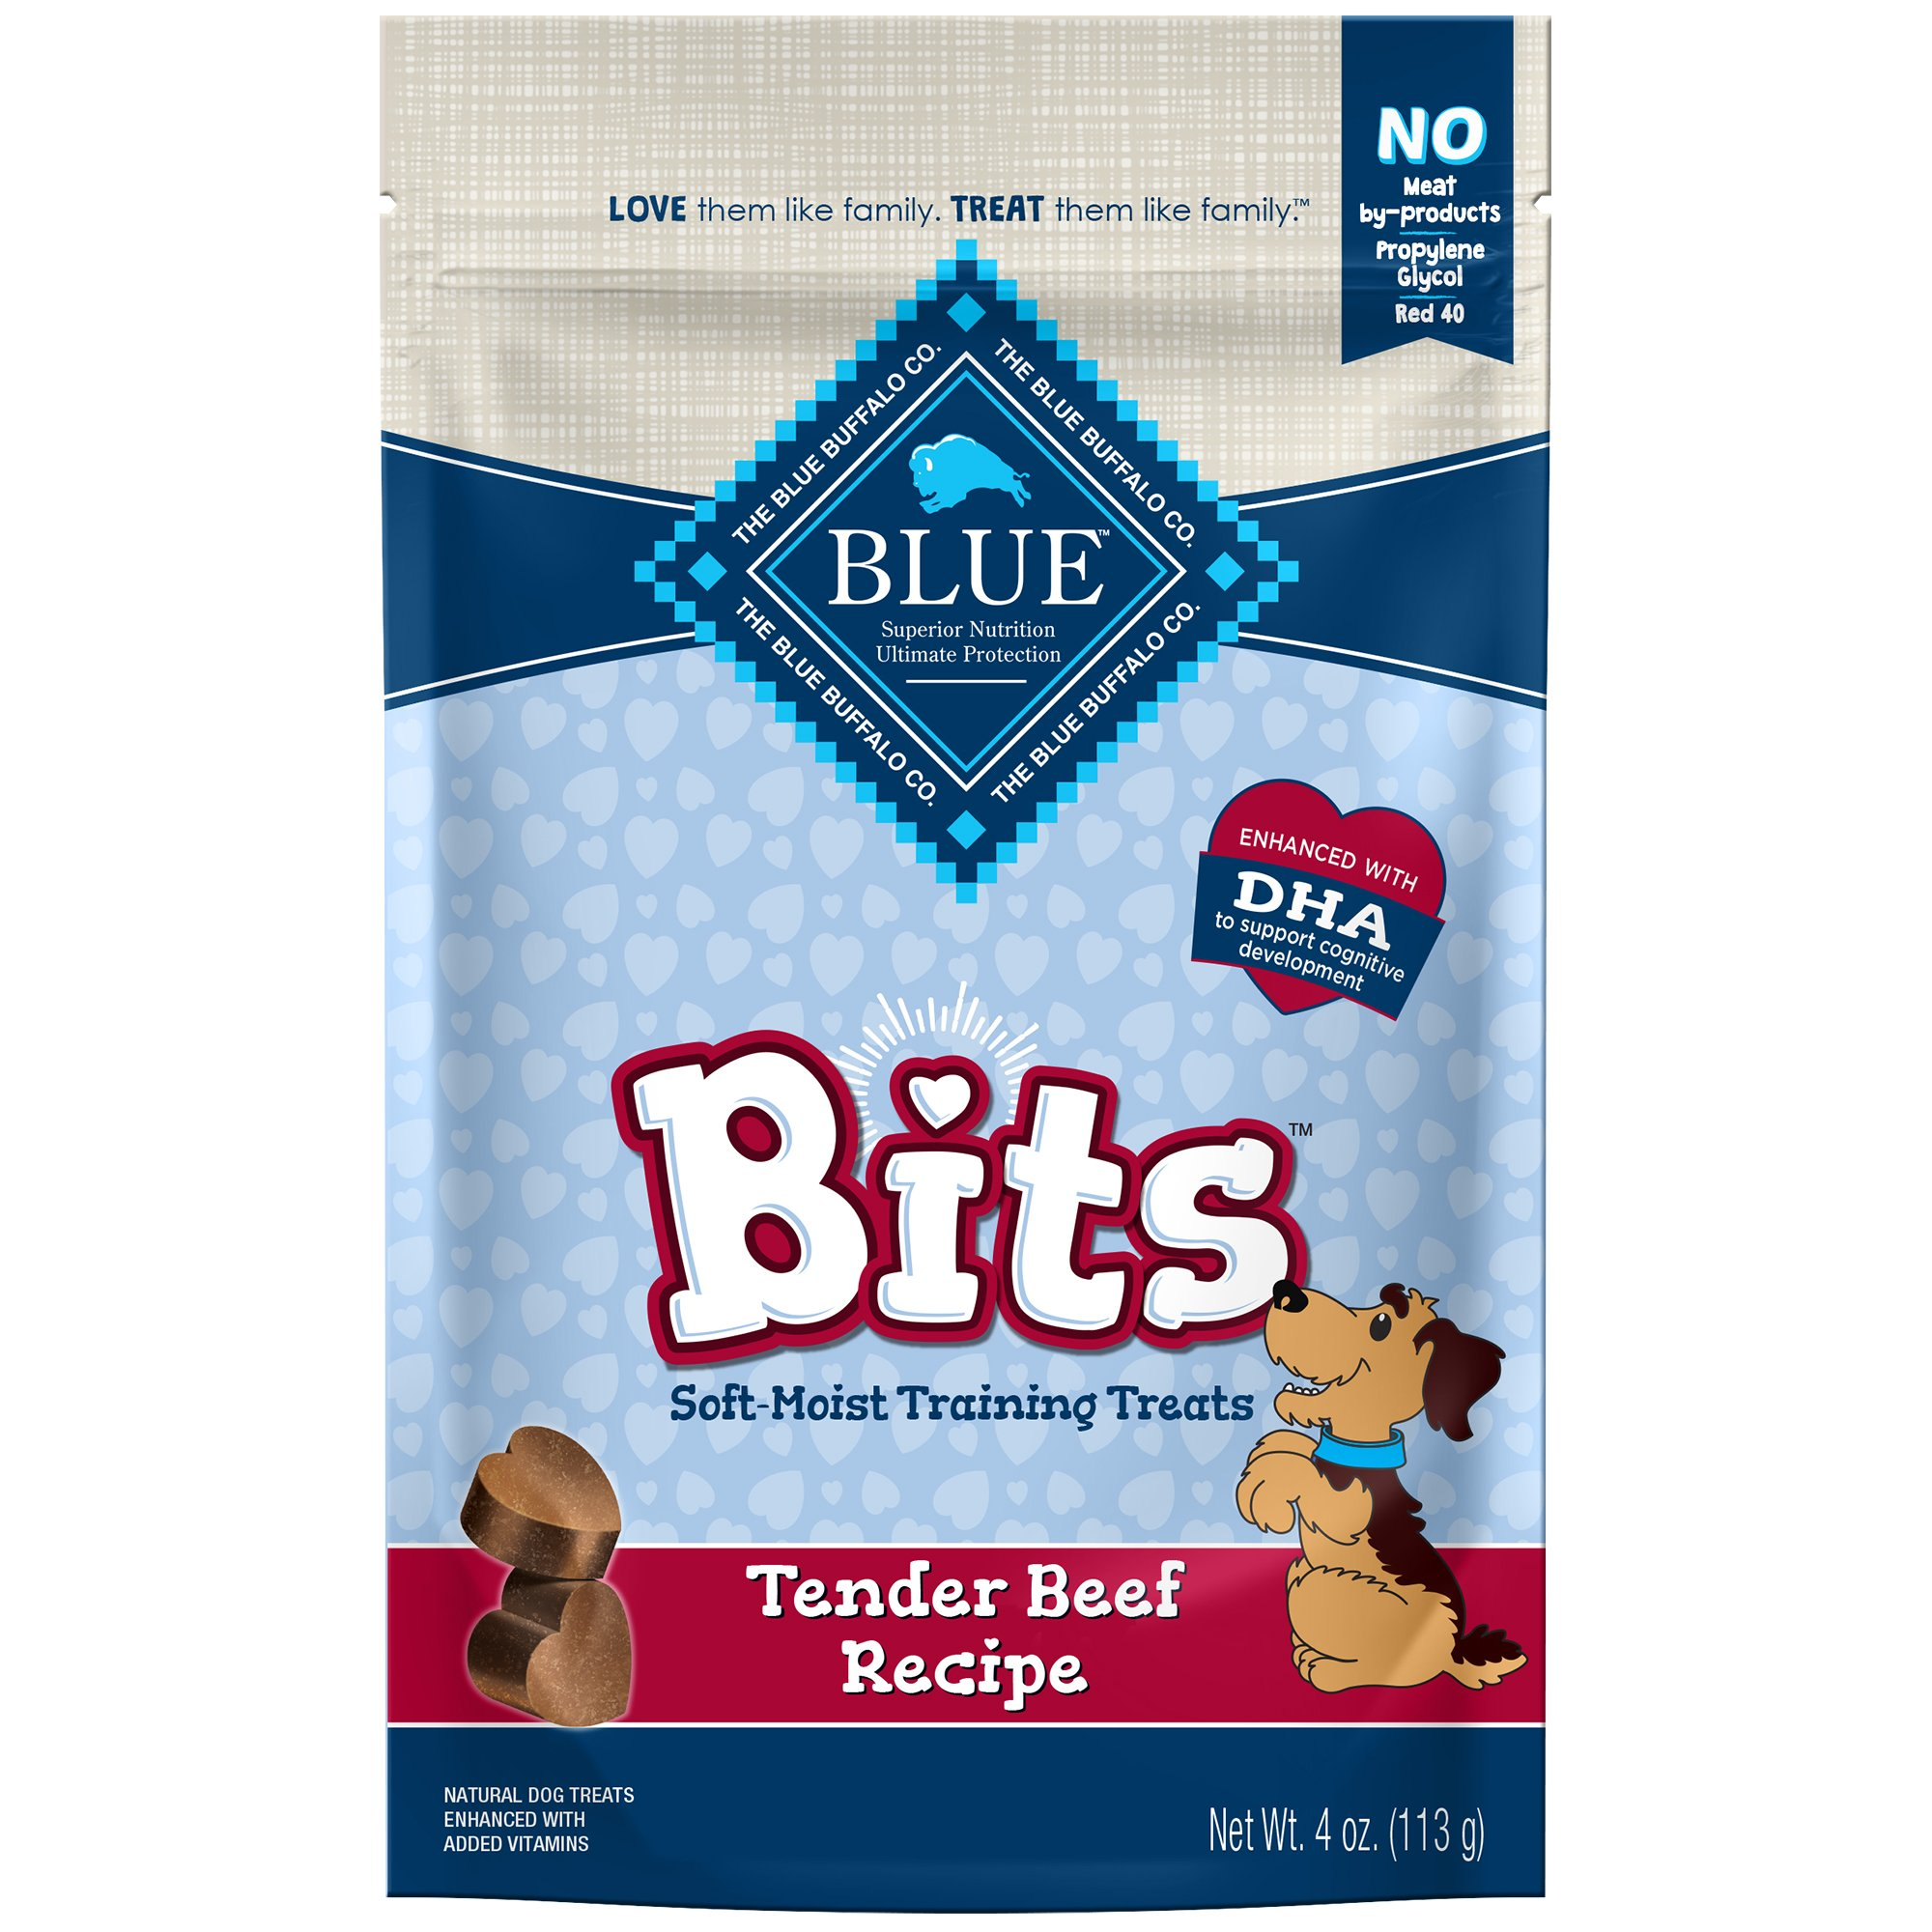 Petco Blue Buffalo Dog Food Coupons